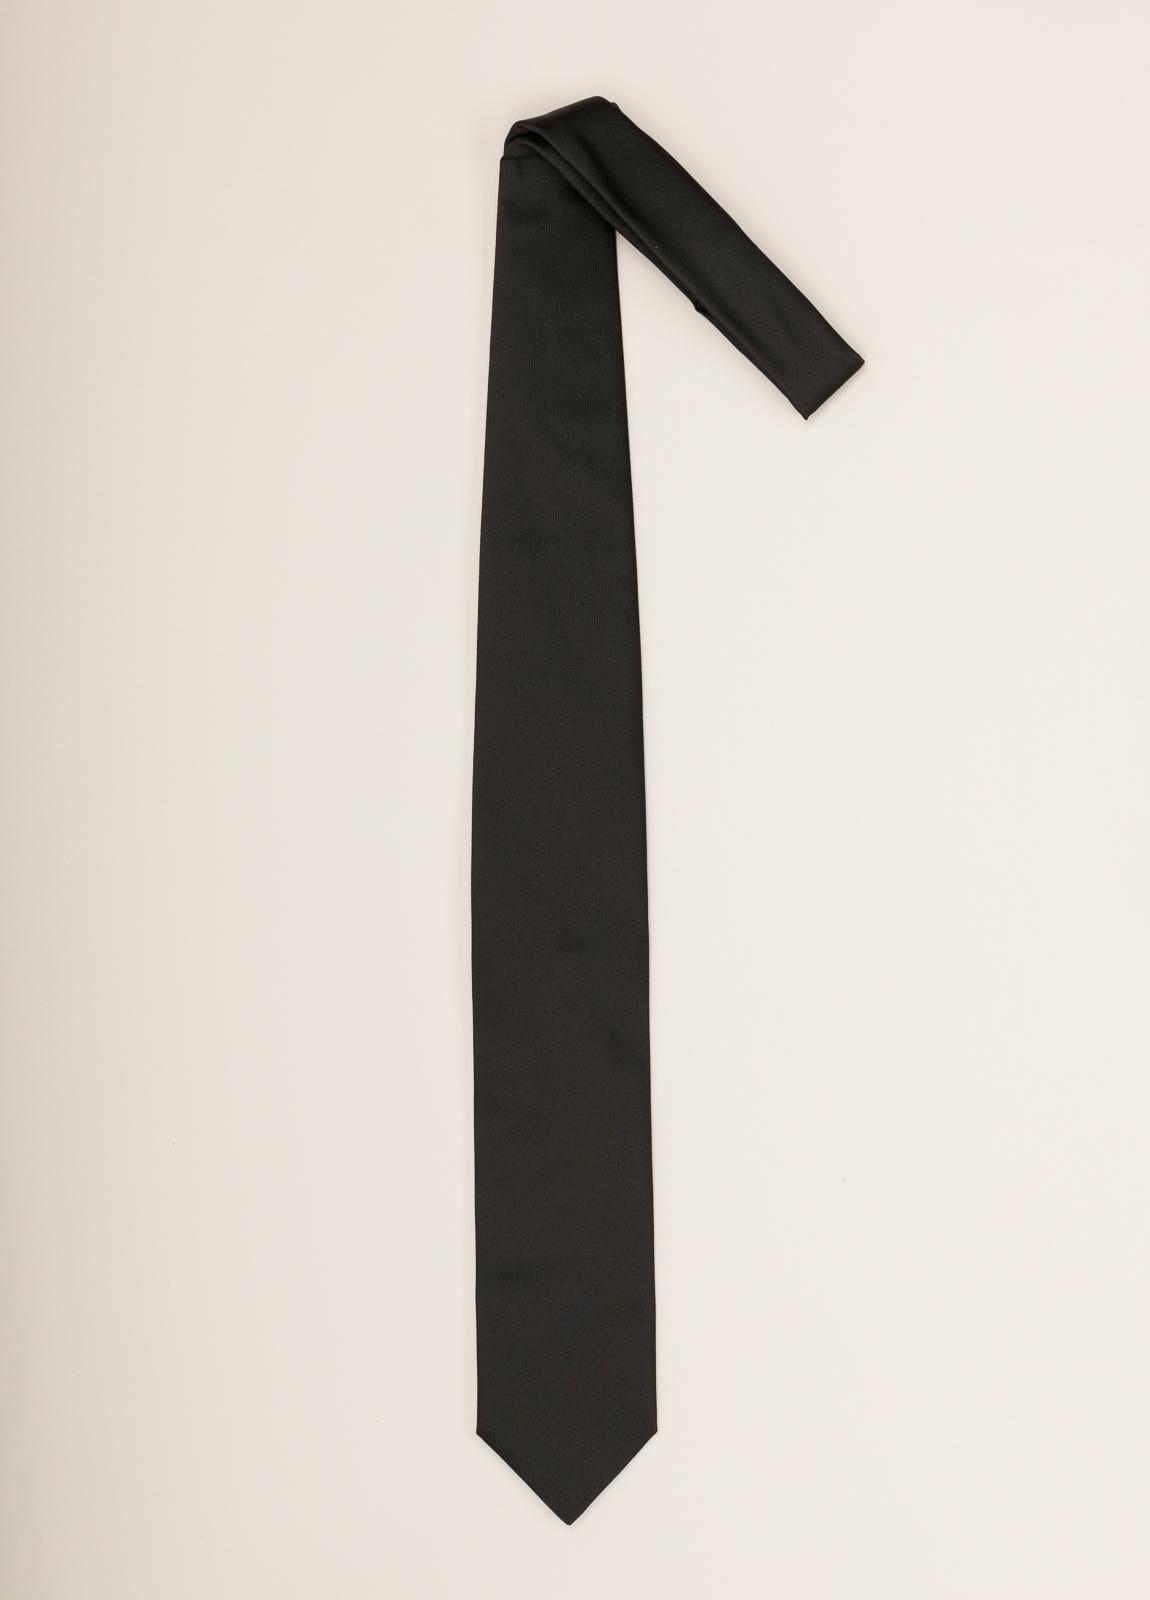 Corbata FUREST COLECCIÓN negro - Ítem1